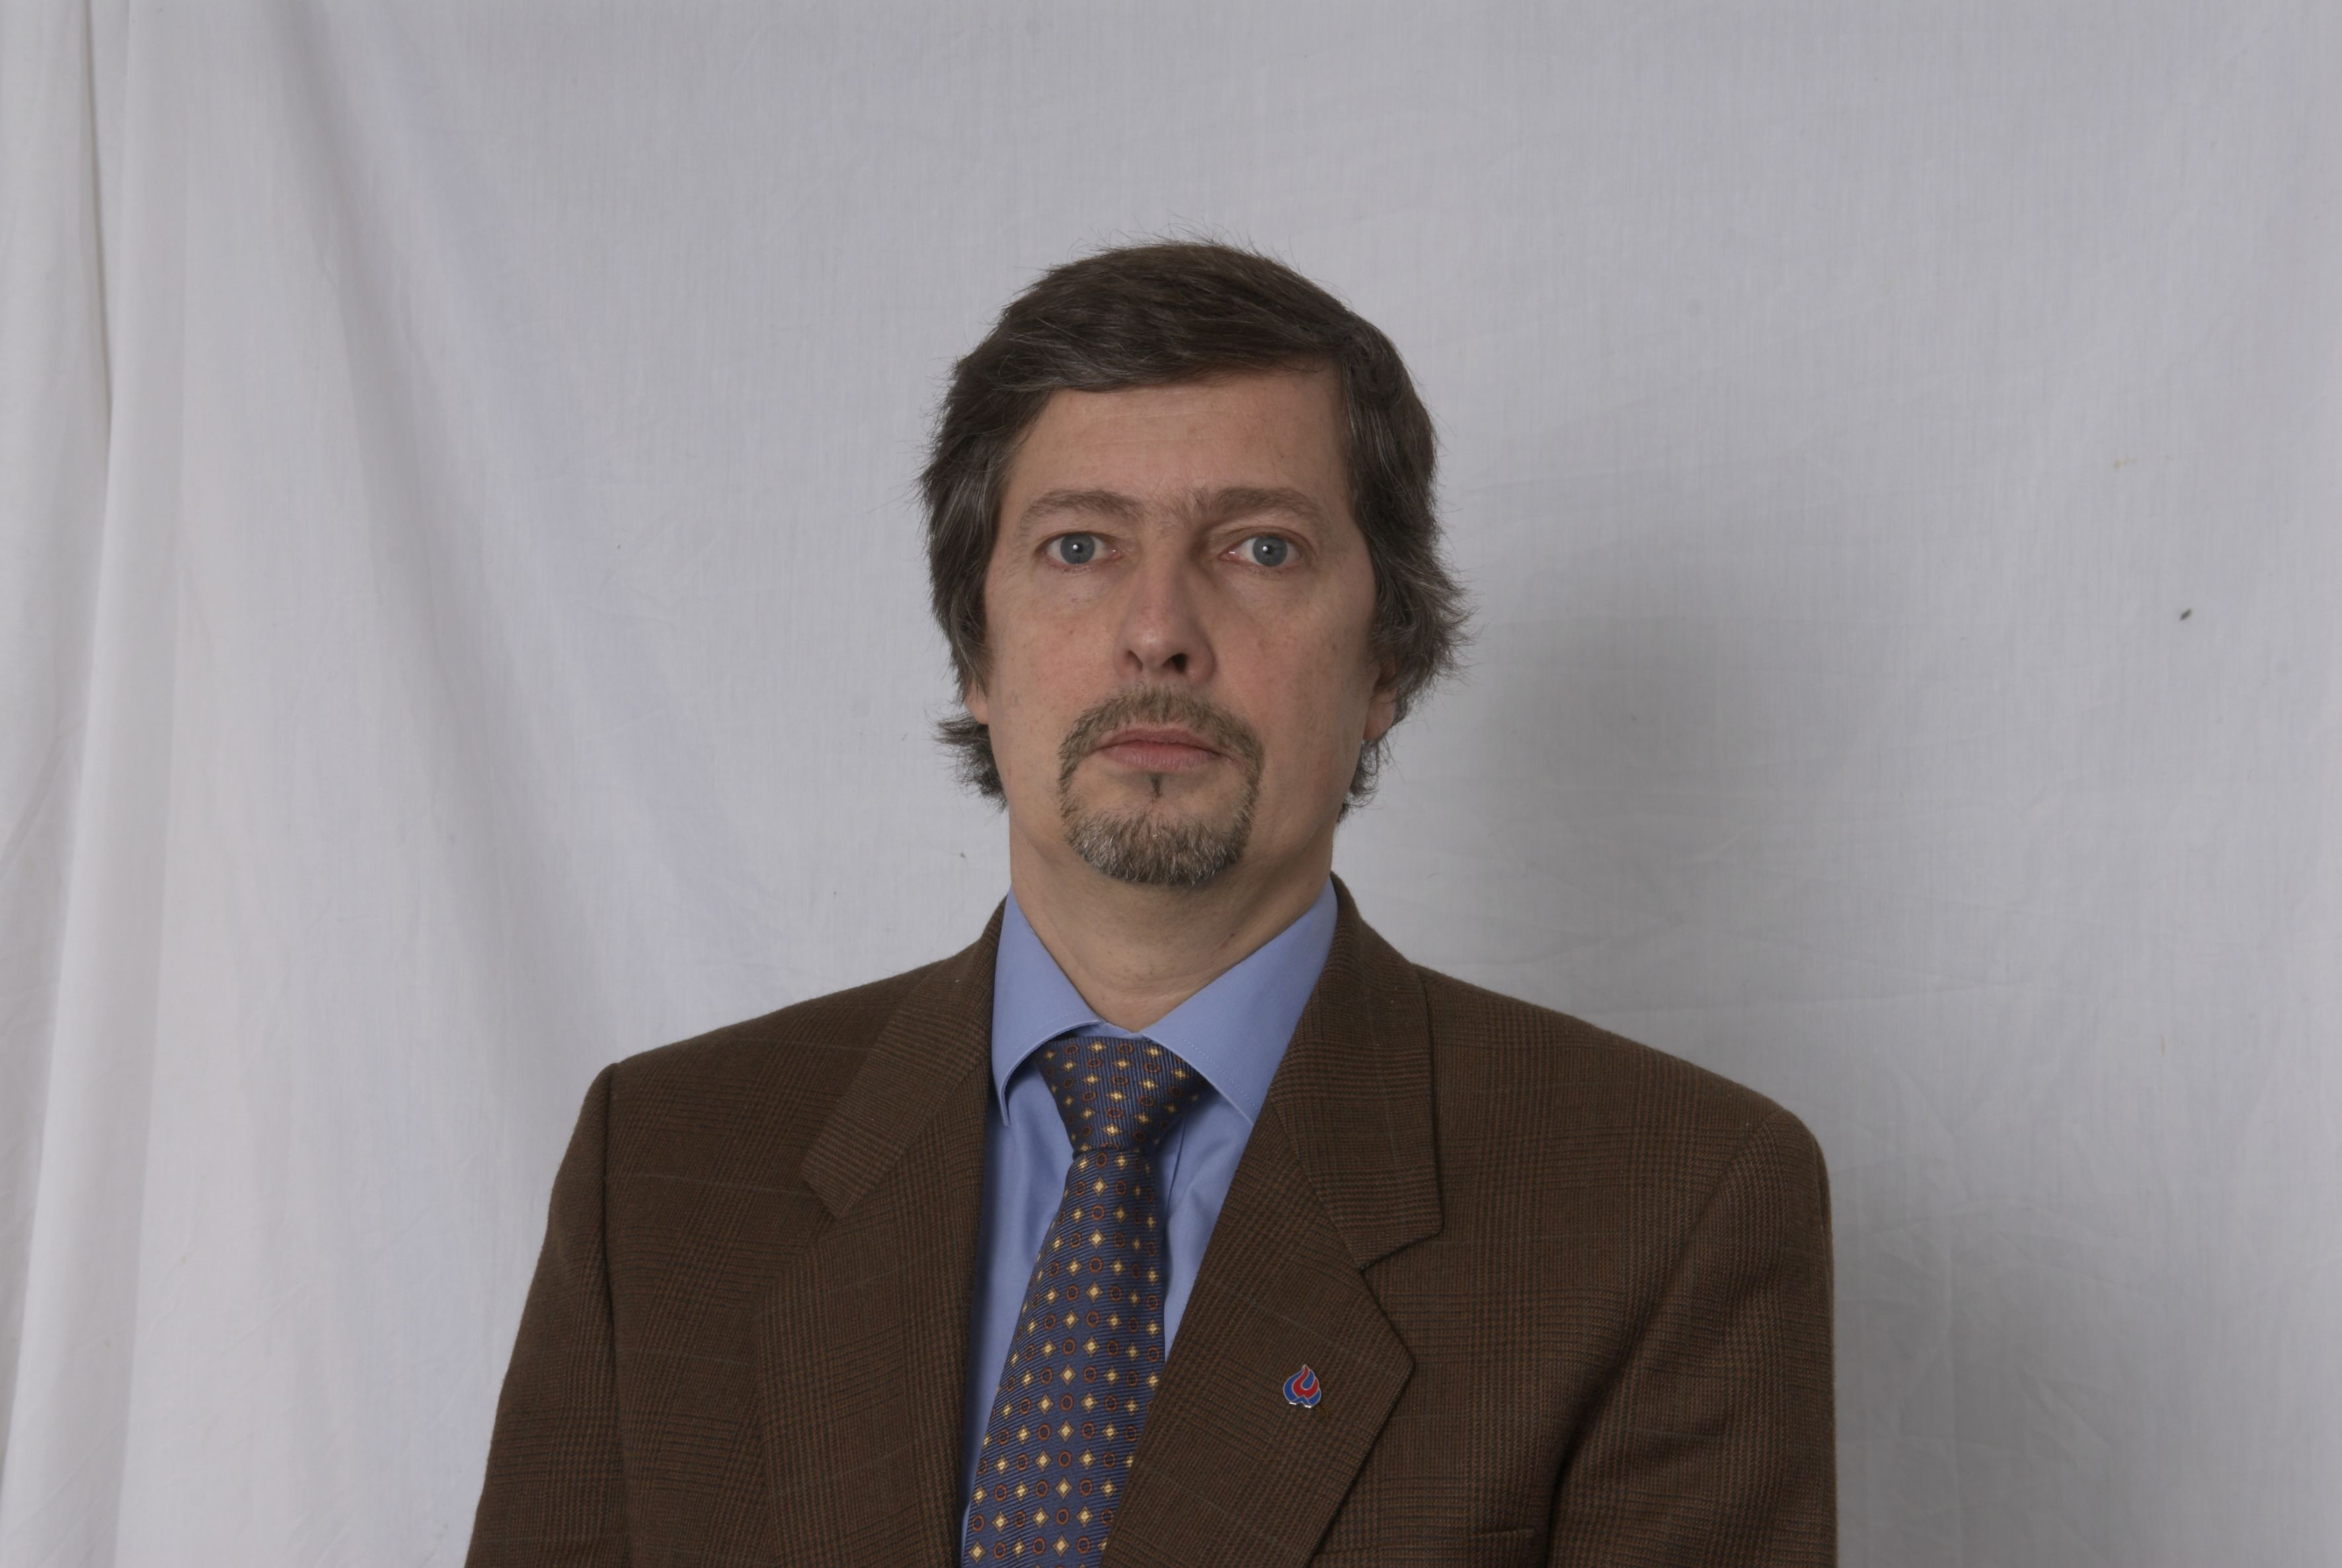 Vídeo: André Ventura volta a fazer críticas aos ciganos